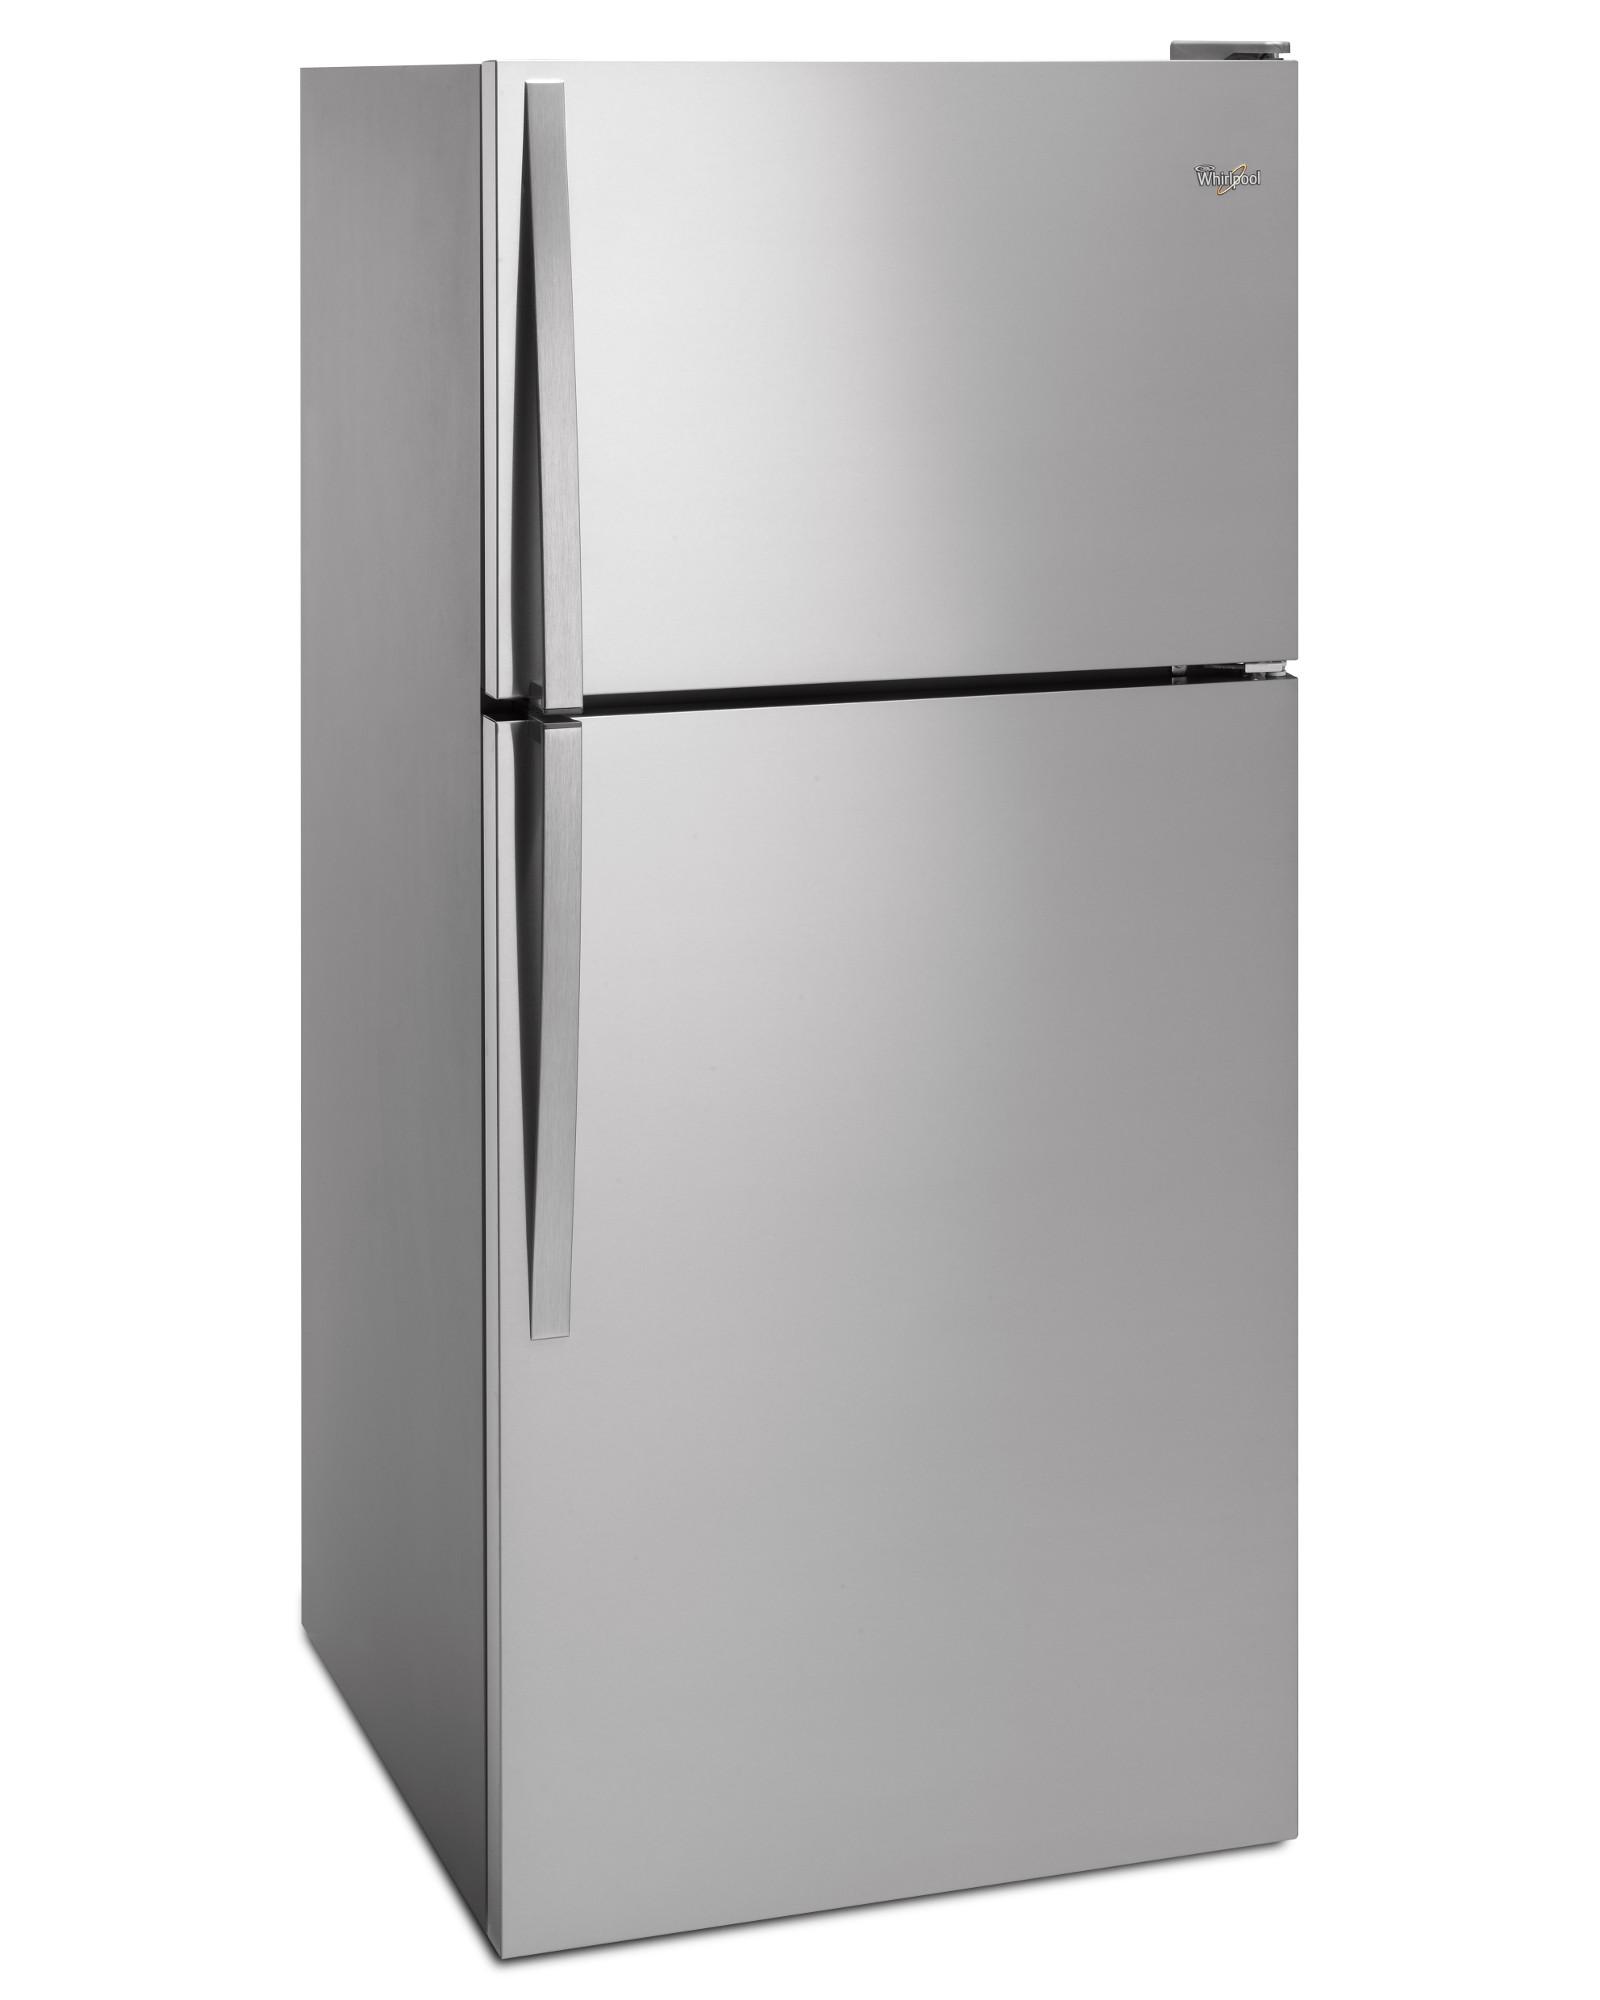 Whirlpool WRT318FZDM 18 cu. ft. Top Freezer Refrigerator - Stainless Steel